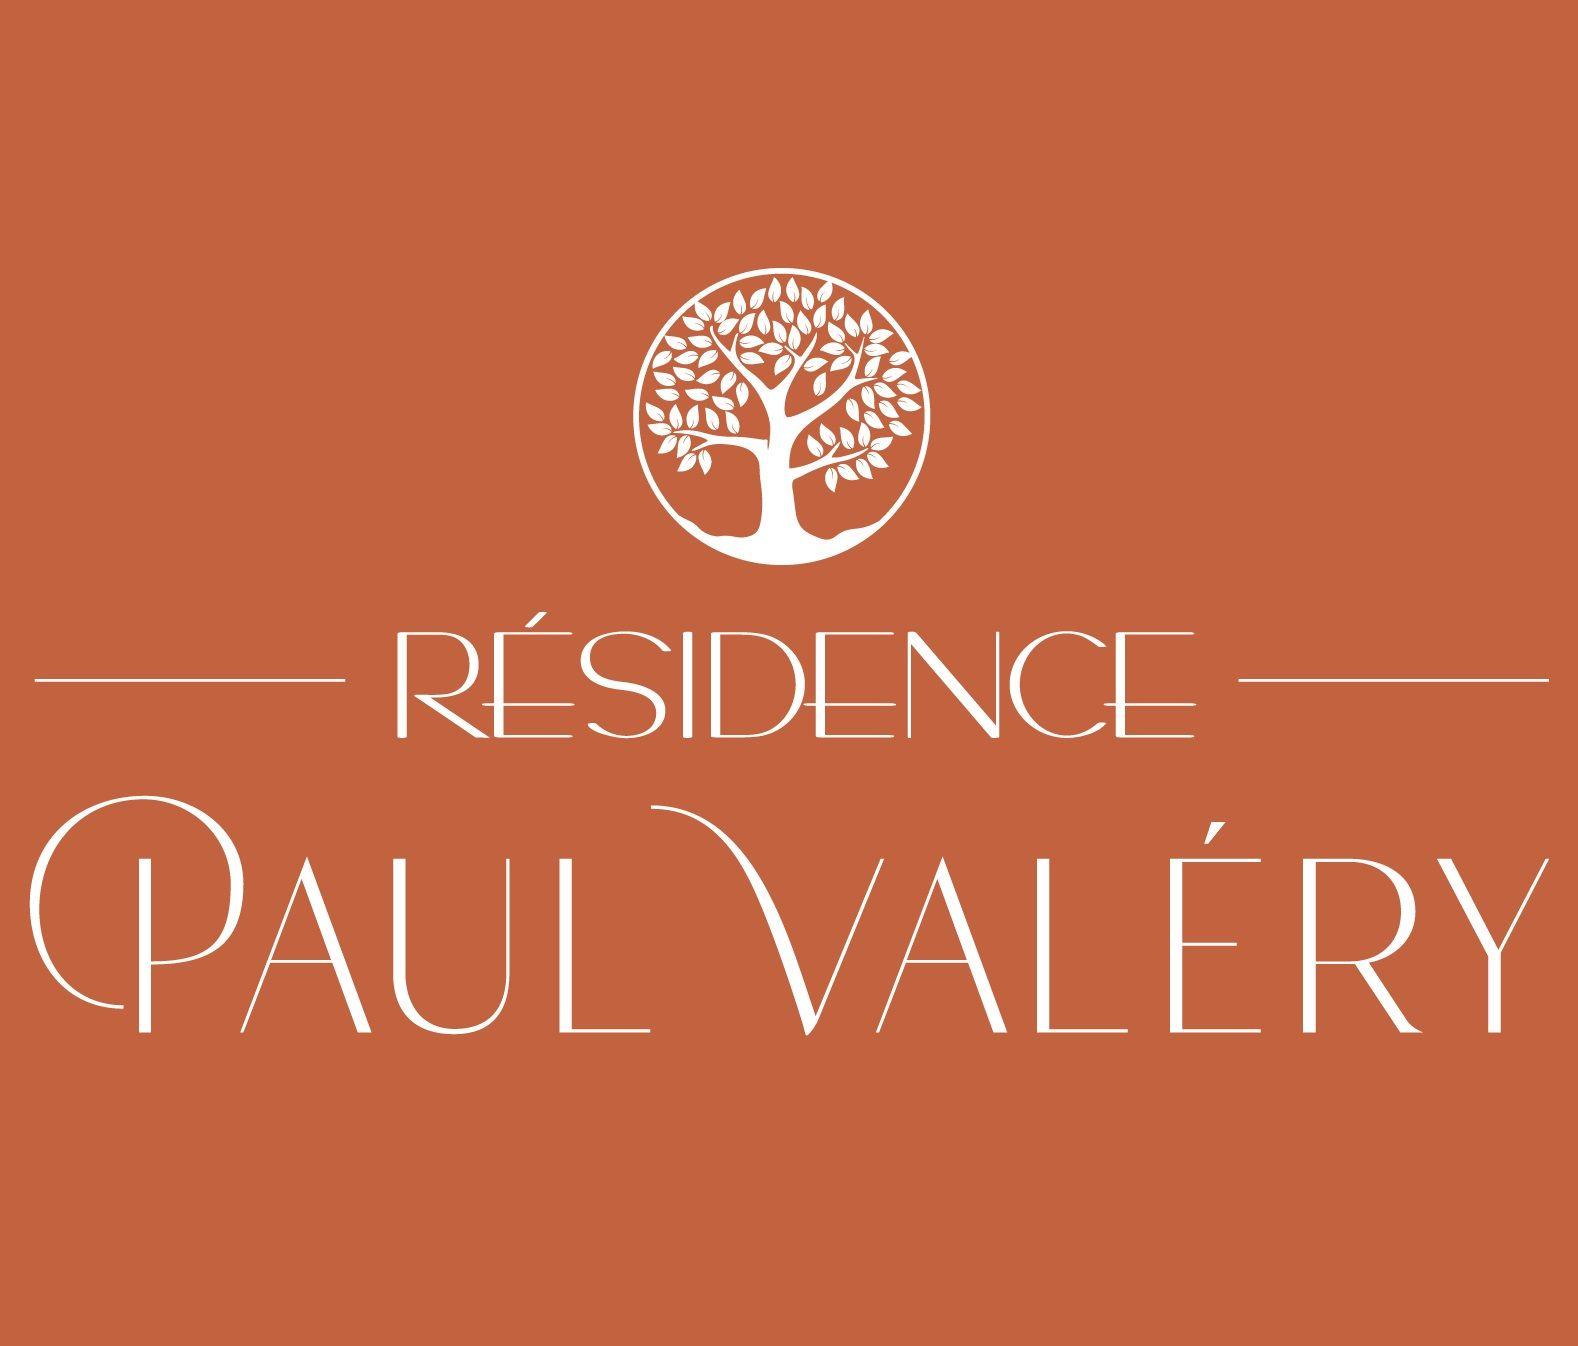 PAUL VALERY, programme immobilier HABITEC HABITEC, NIMES - GARD